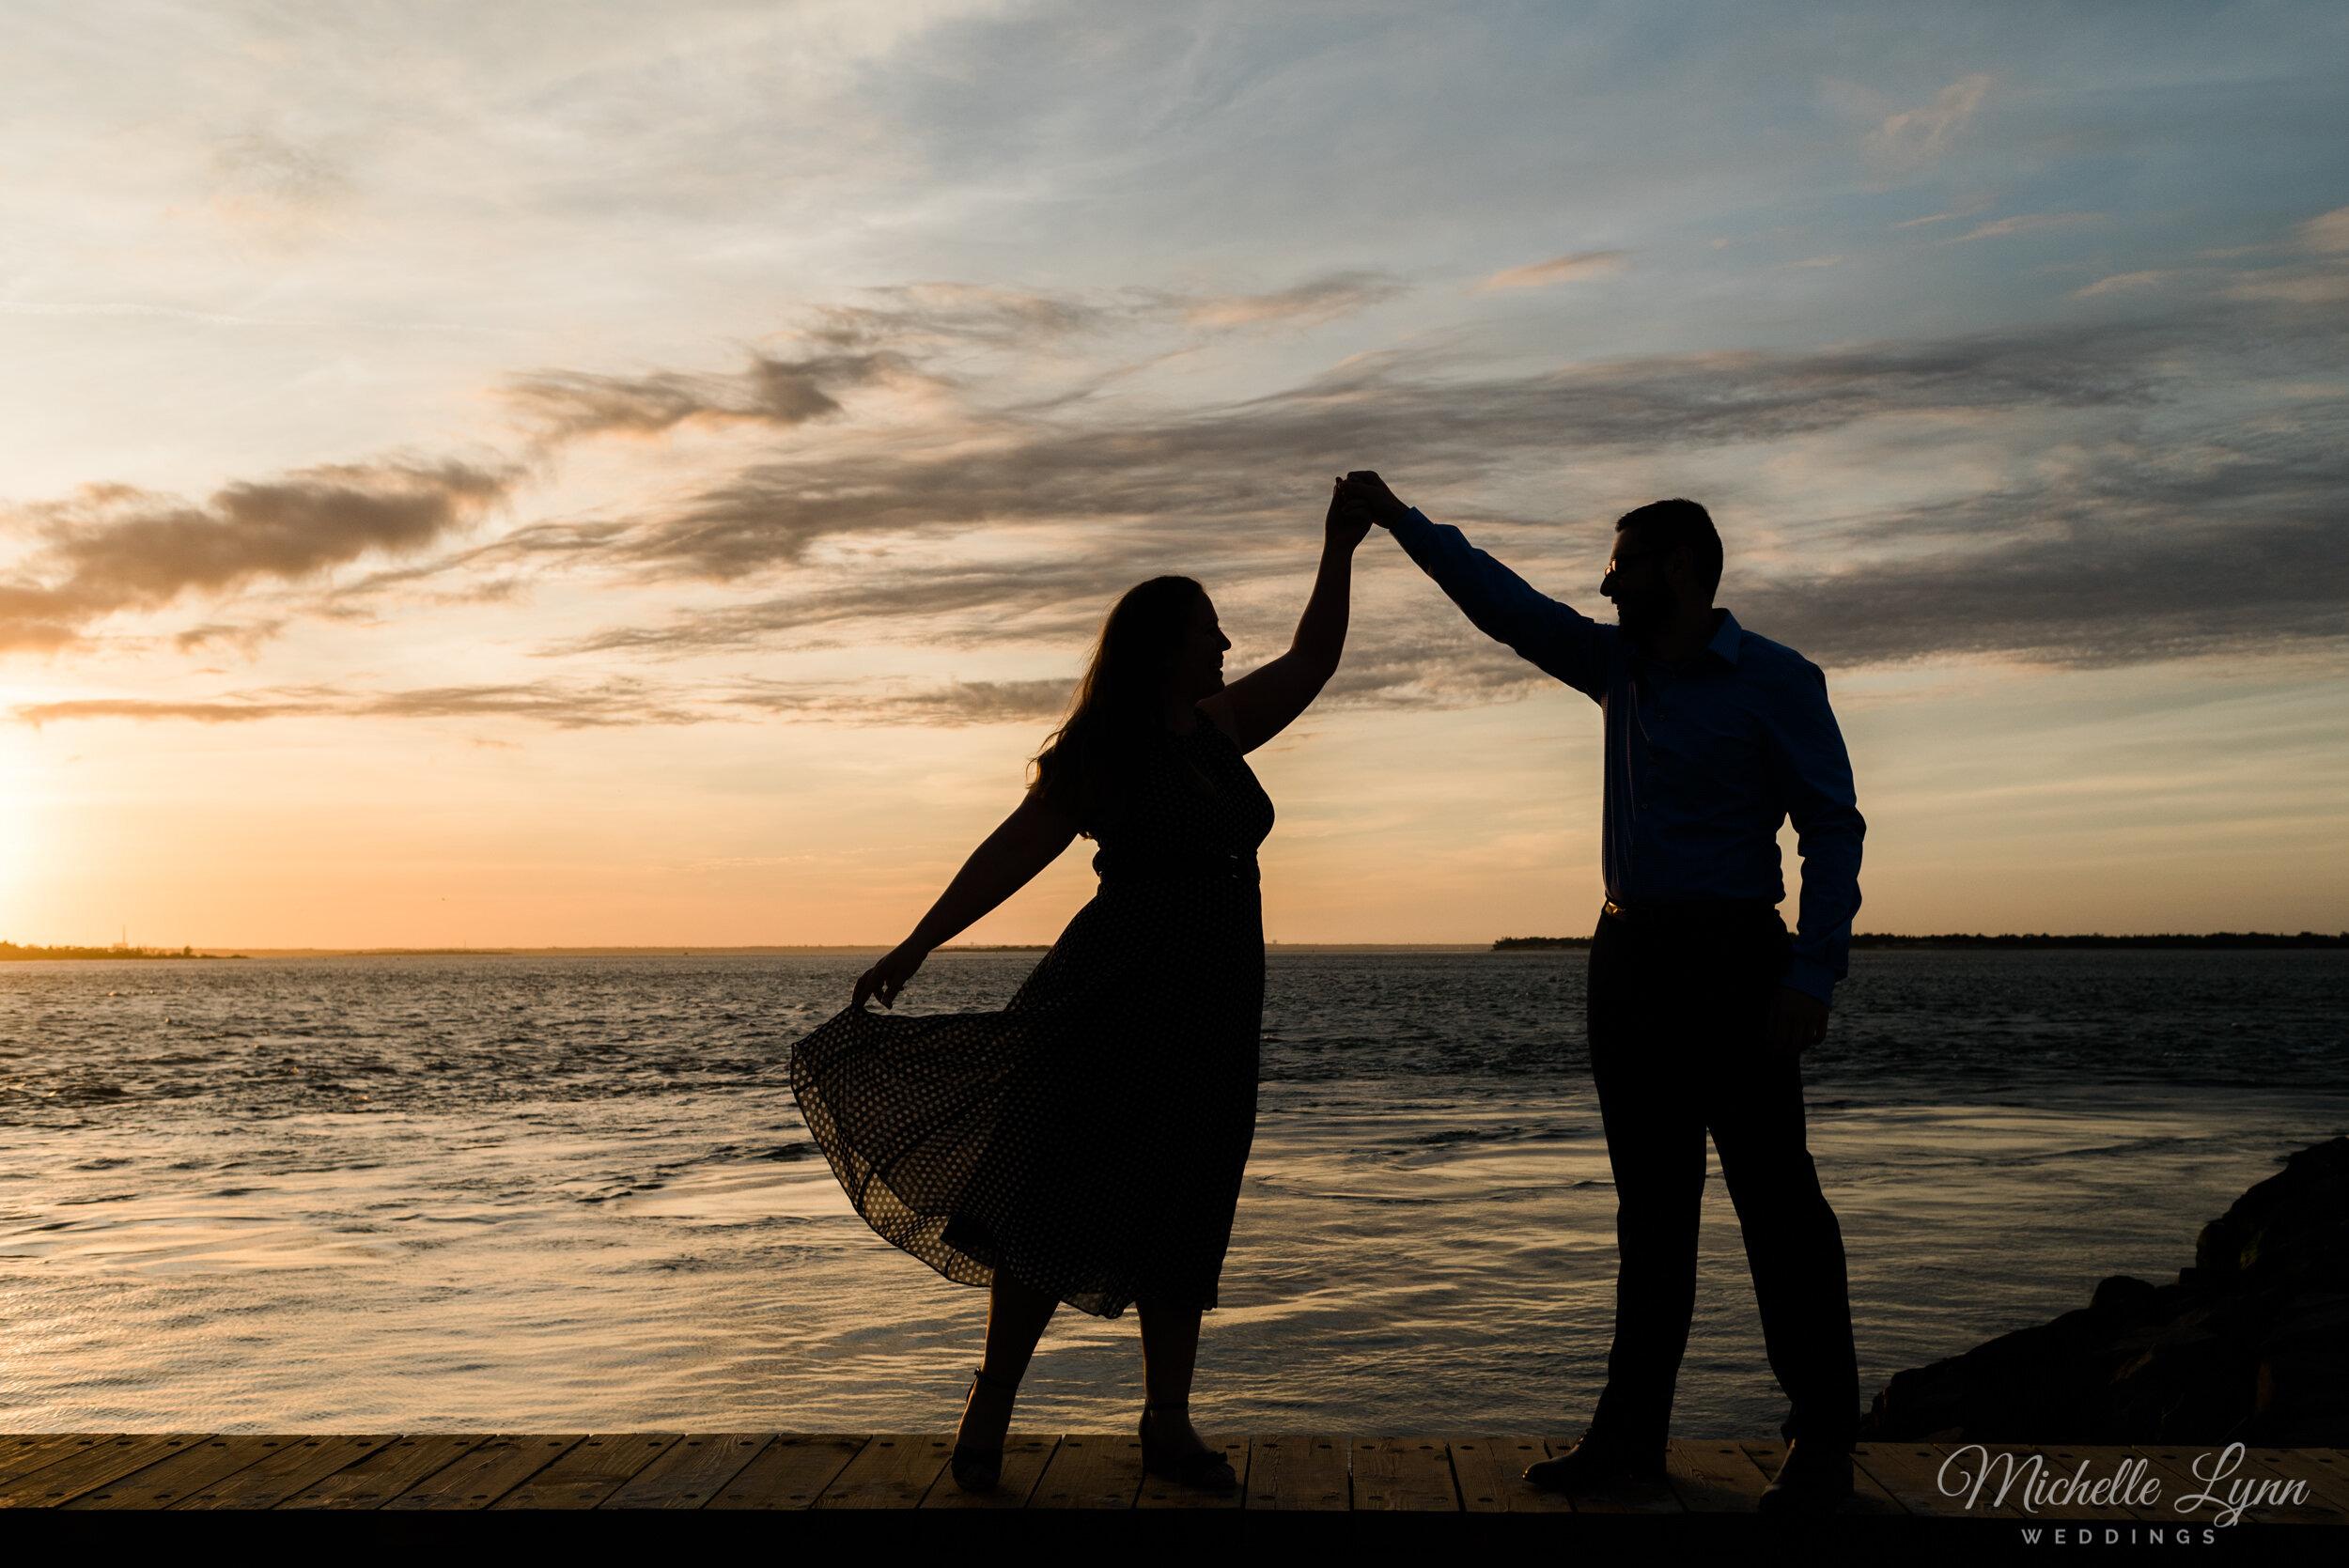 barnegat-lighthouse-engagement-photos-michelle-lynn-weddings-27.jpg